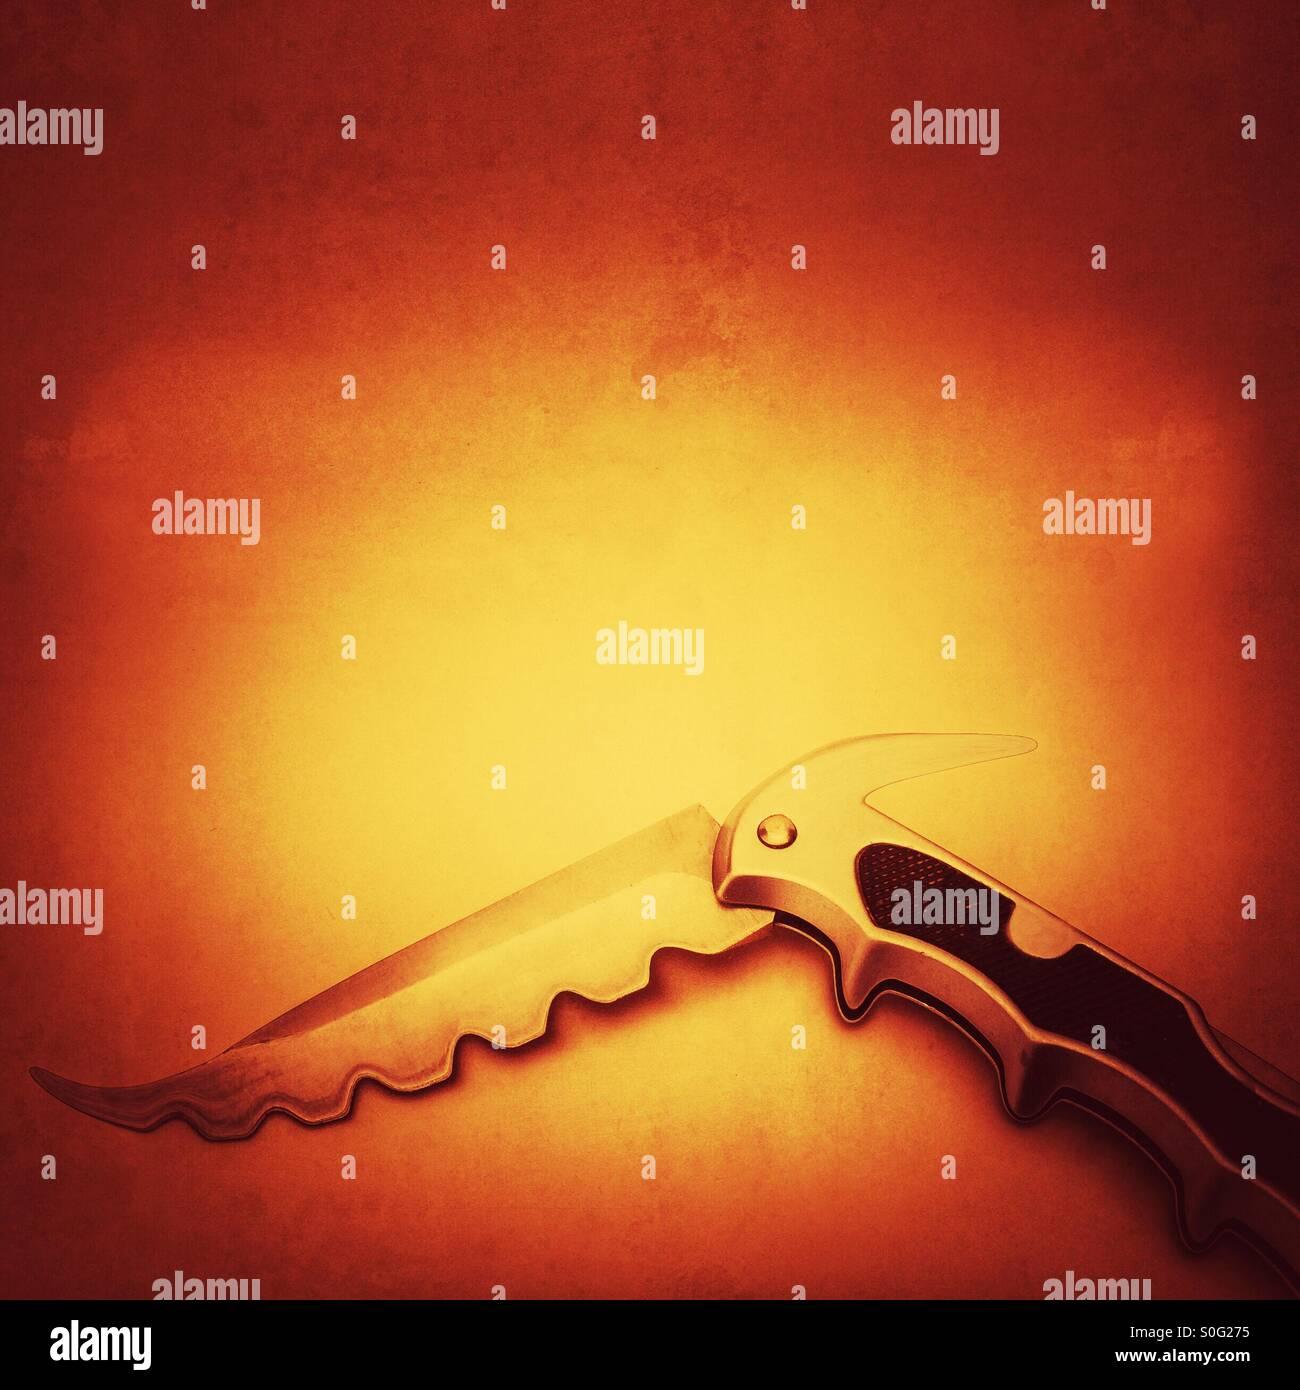 Savage looking pocket knife - Stock Image